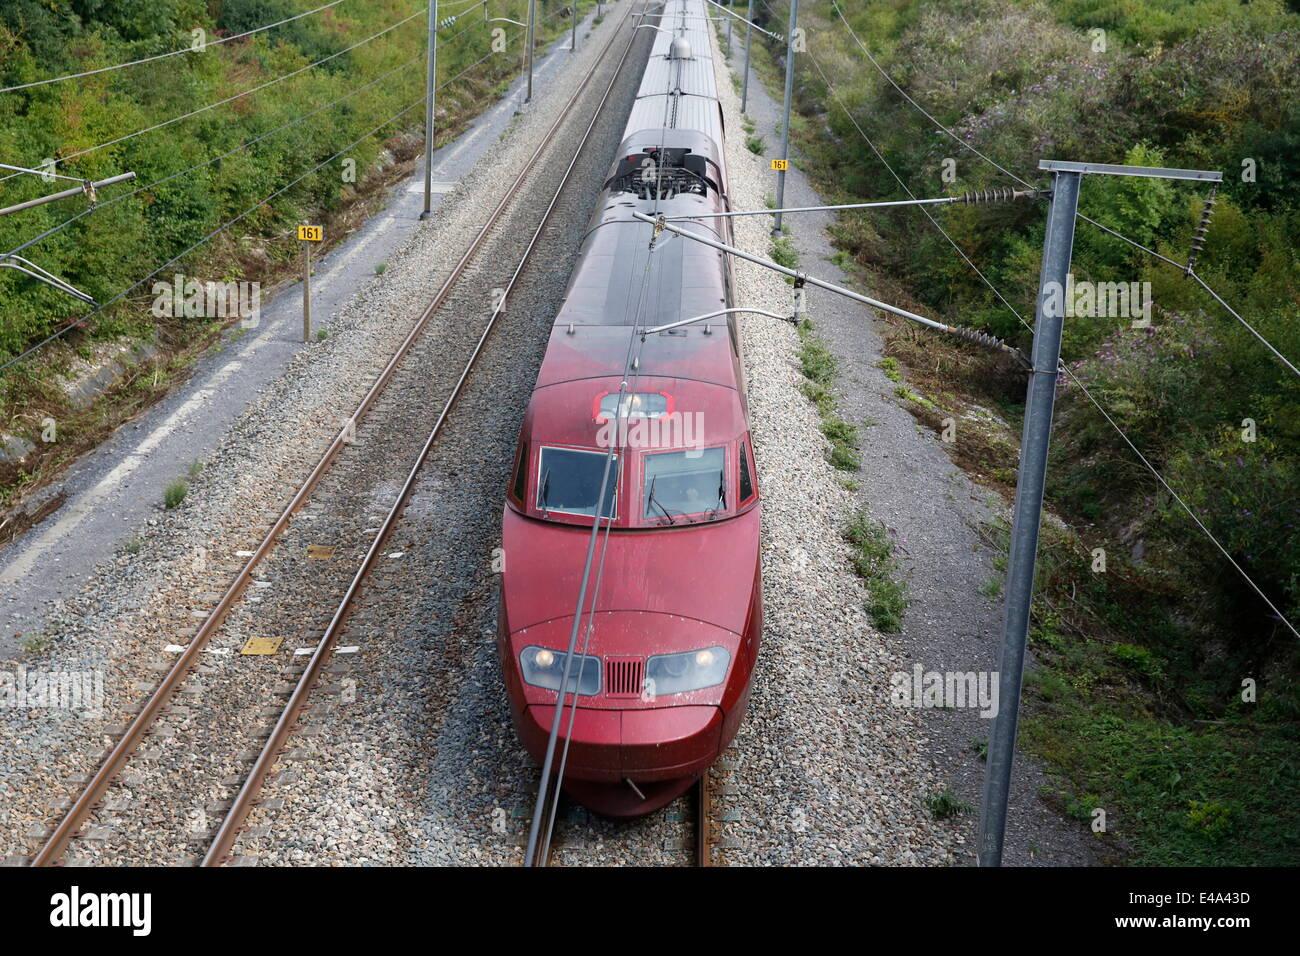 High-speed Thalys train, Pas-de-Calais, France, Europe - Stock Image